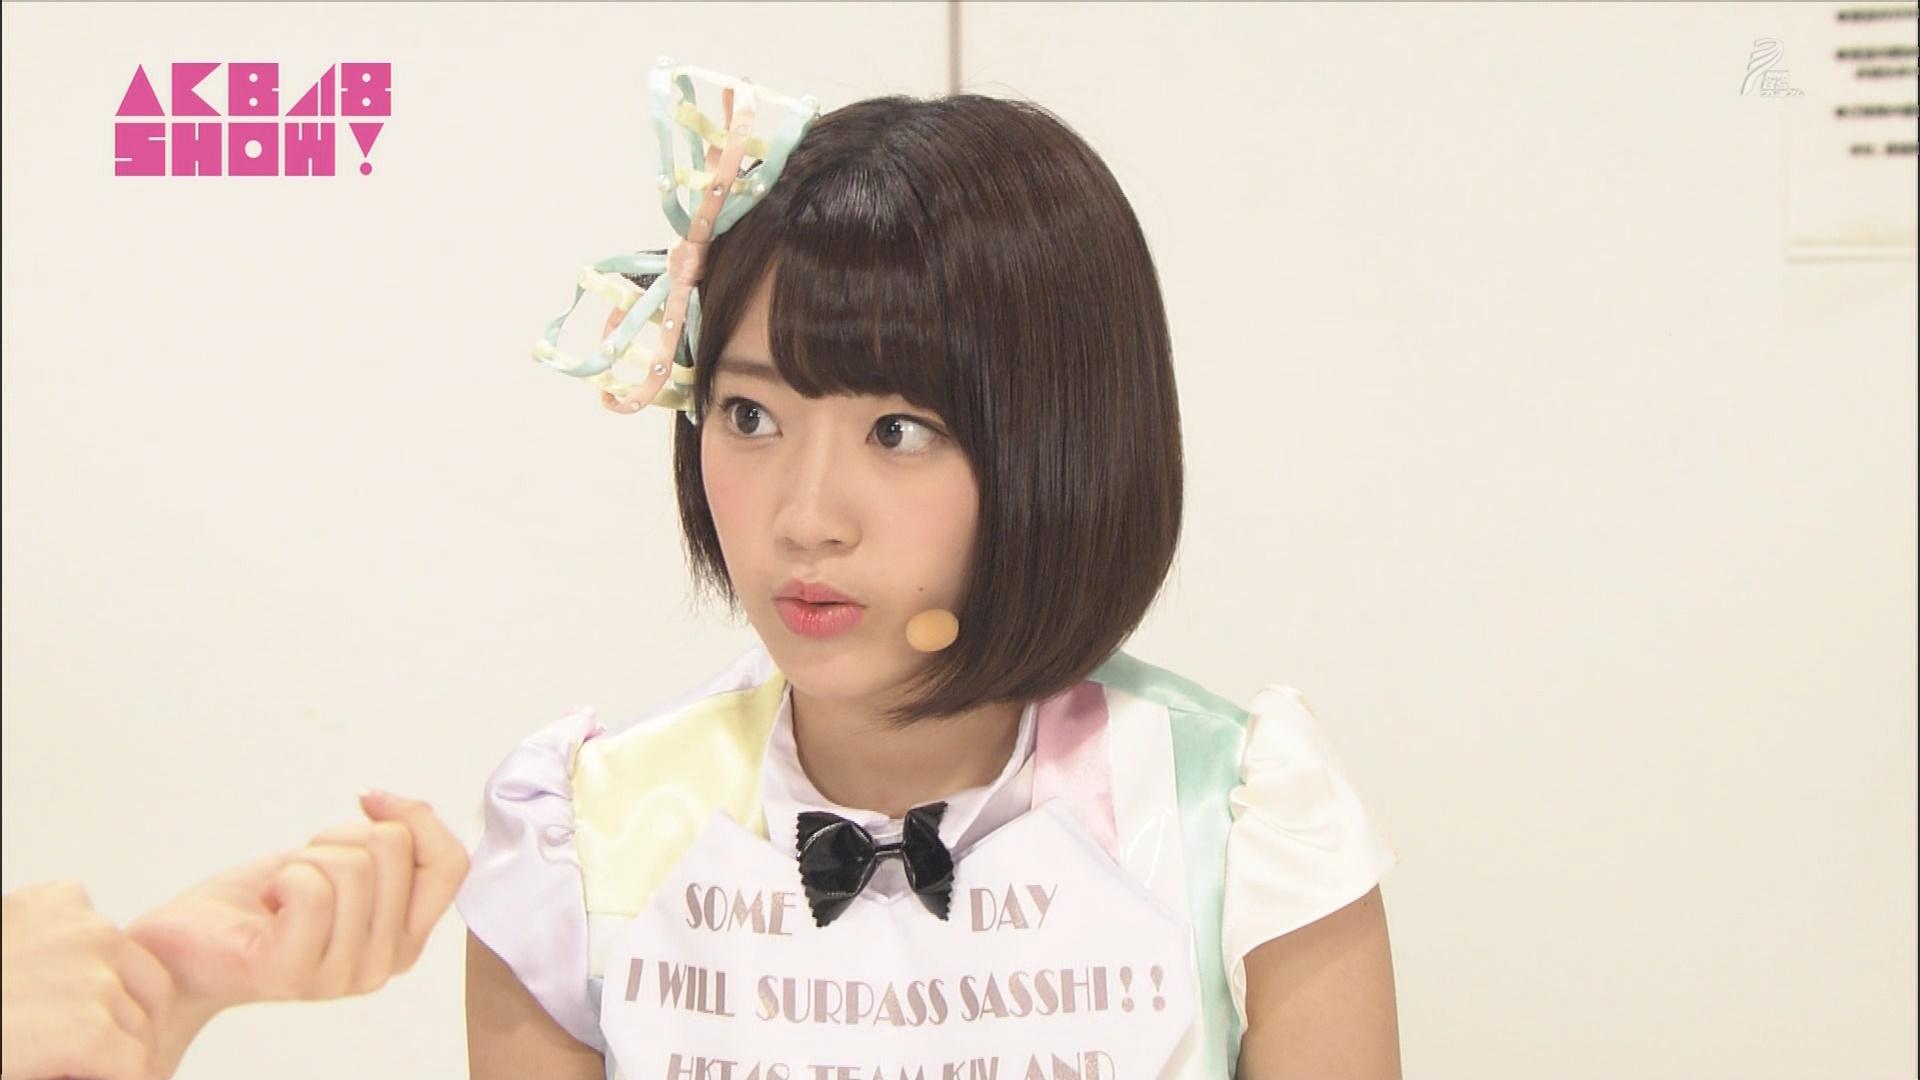 AKB48SHOW 心のプラカード 宮脇咲良 20140830 (4)